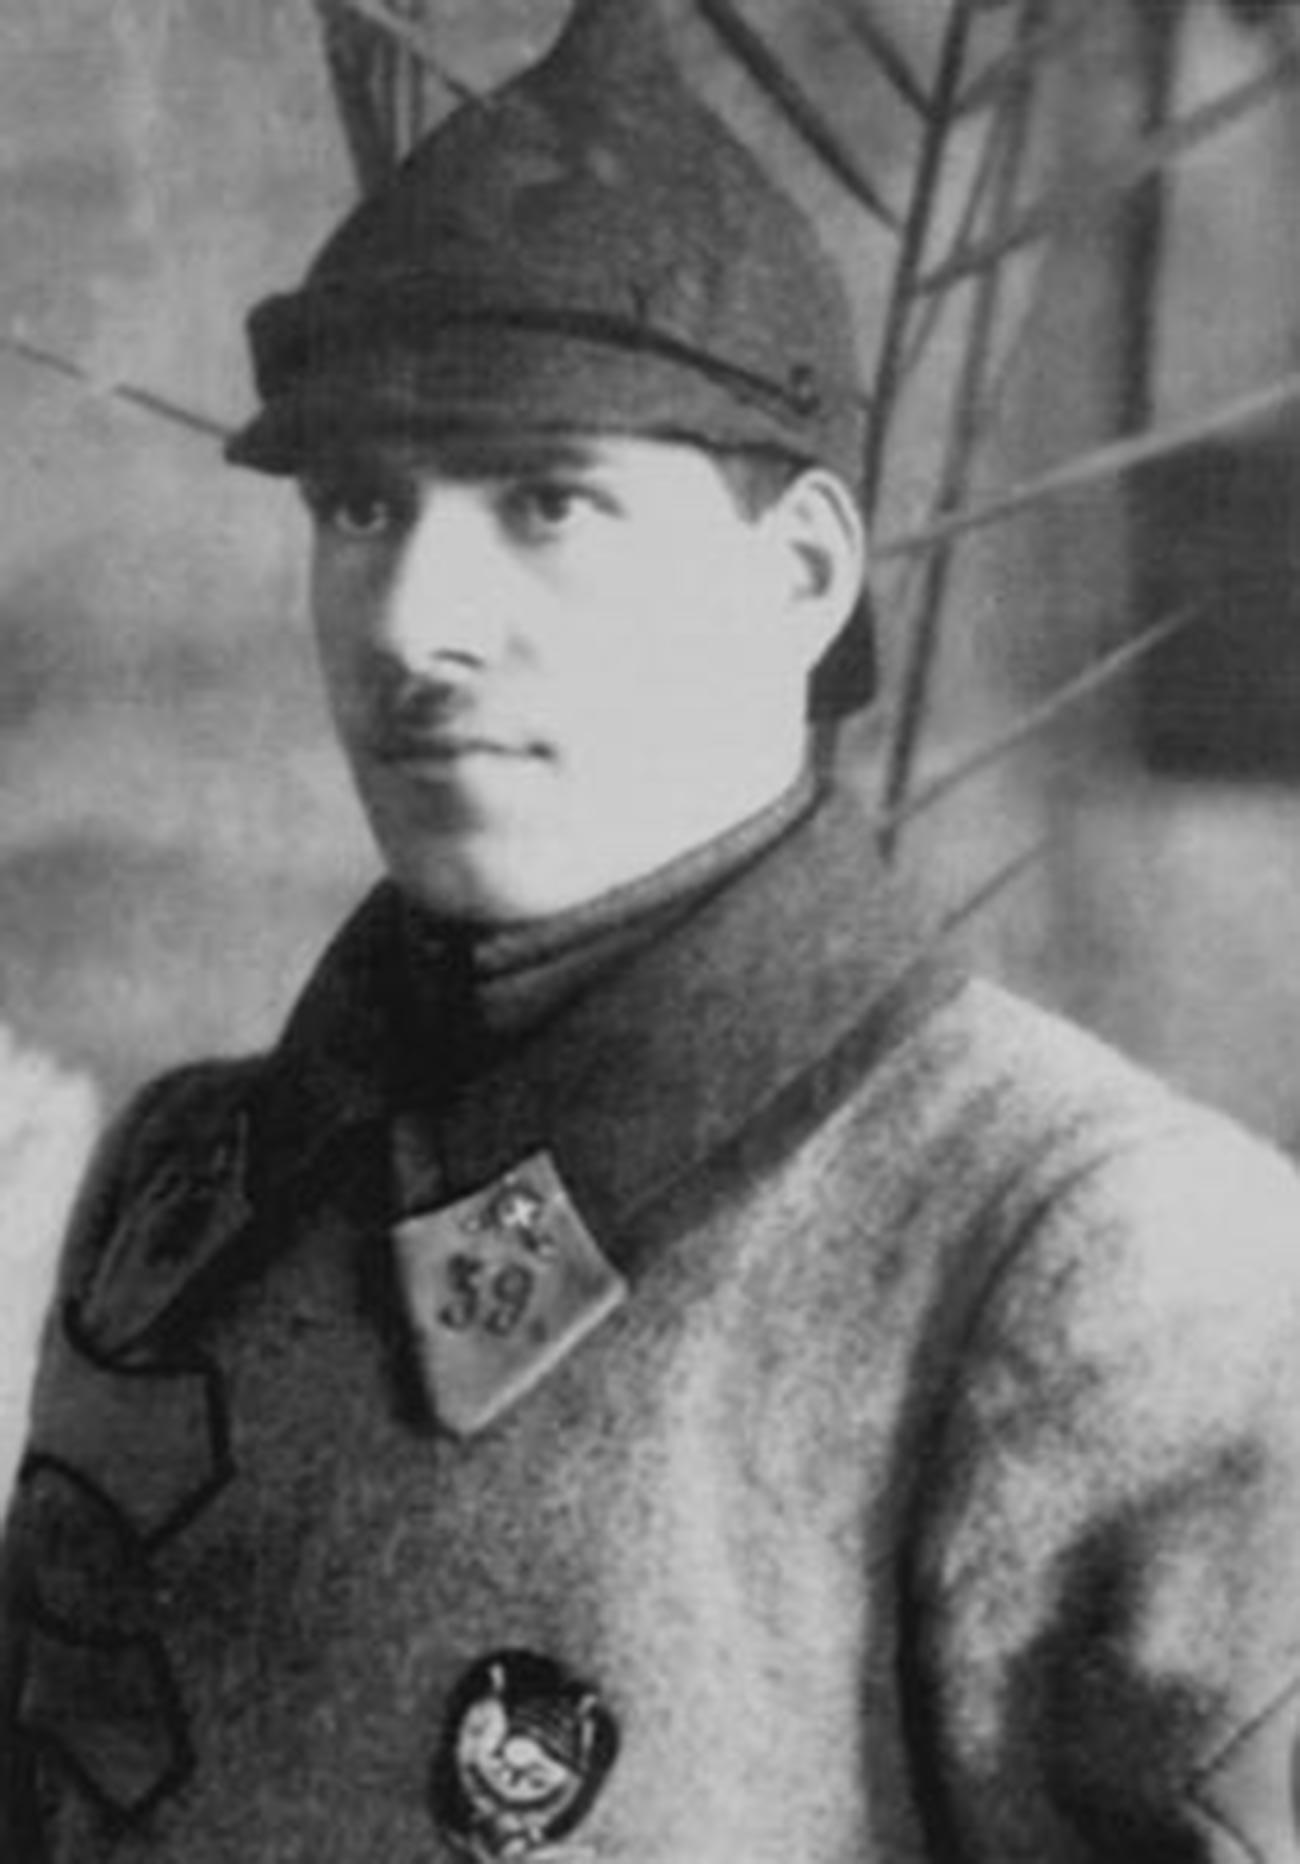 Georgij Zhukov nel 1923